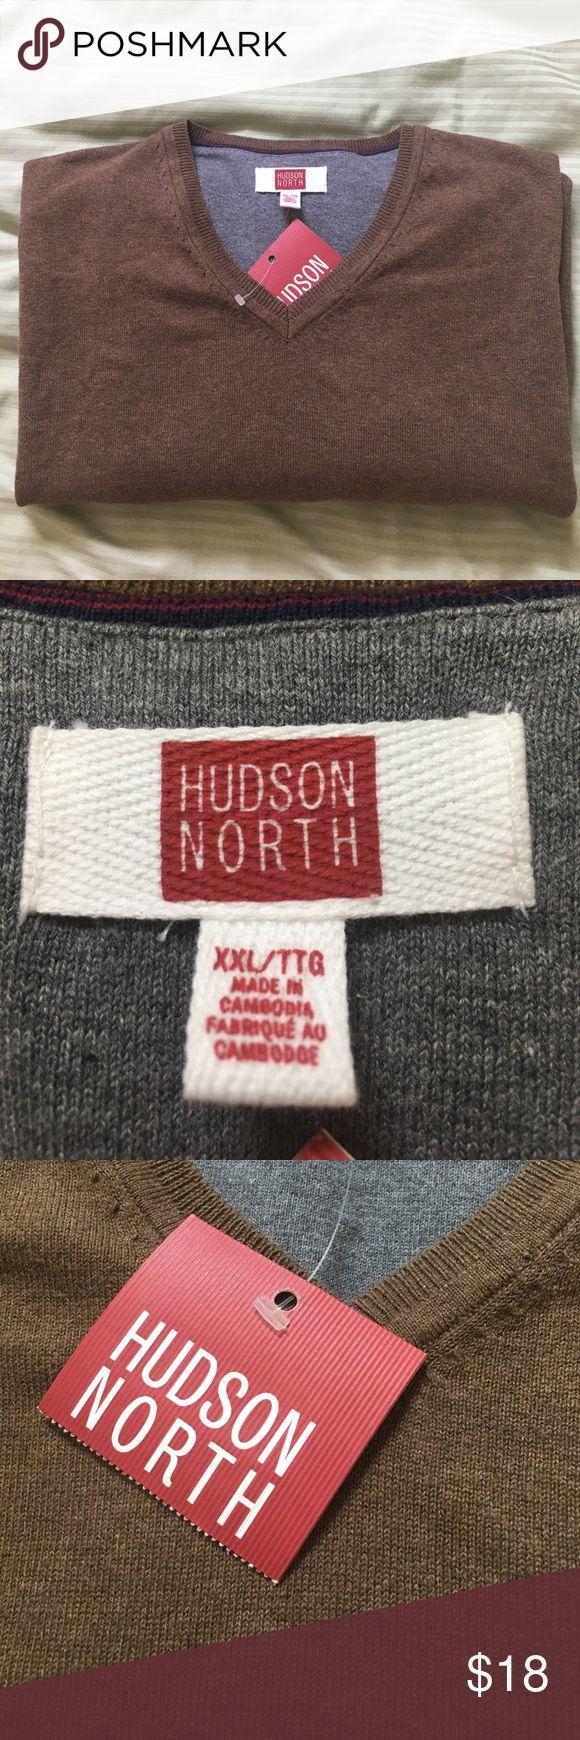 Mens V neck sweater Color is bronze heather, 70% cotton, 30% nylon, machine wash Hudson North Sweaters V-Neck